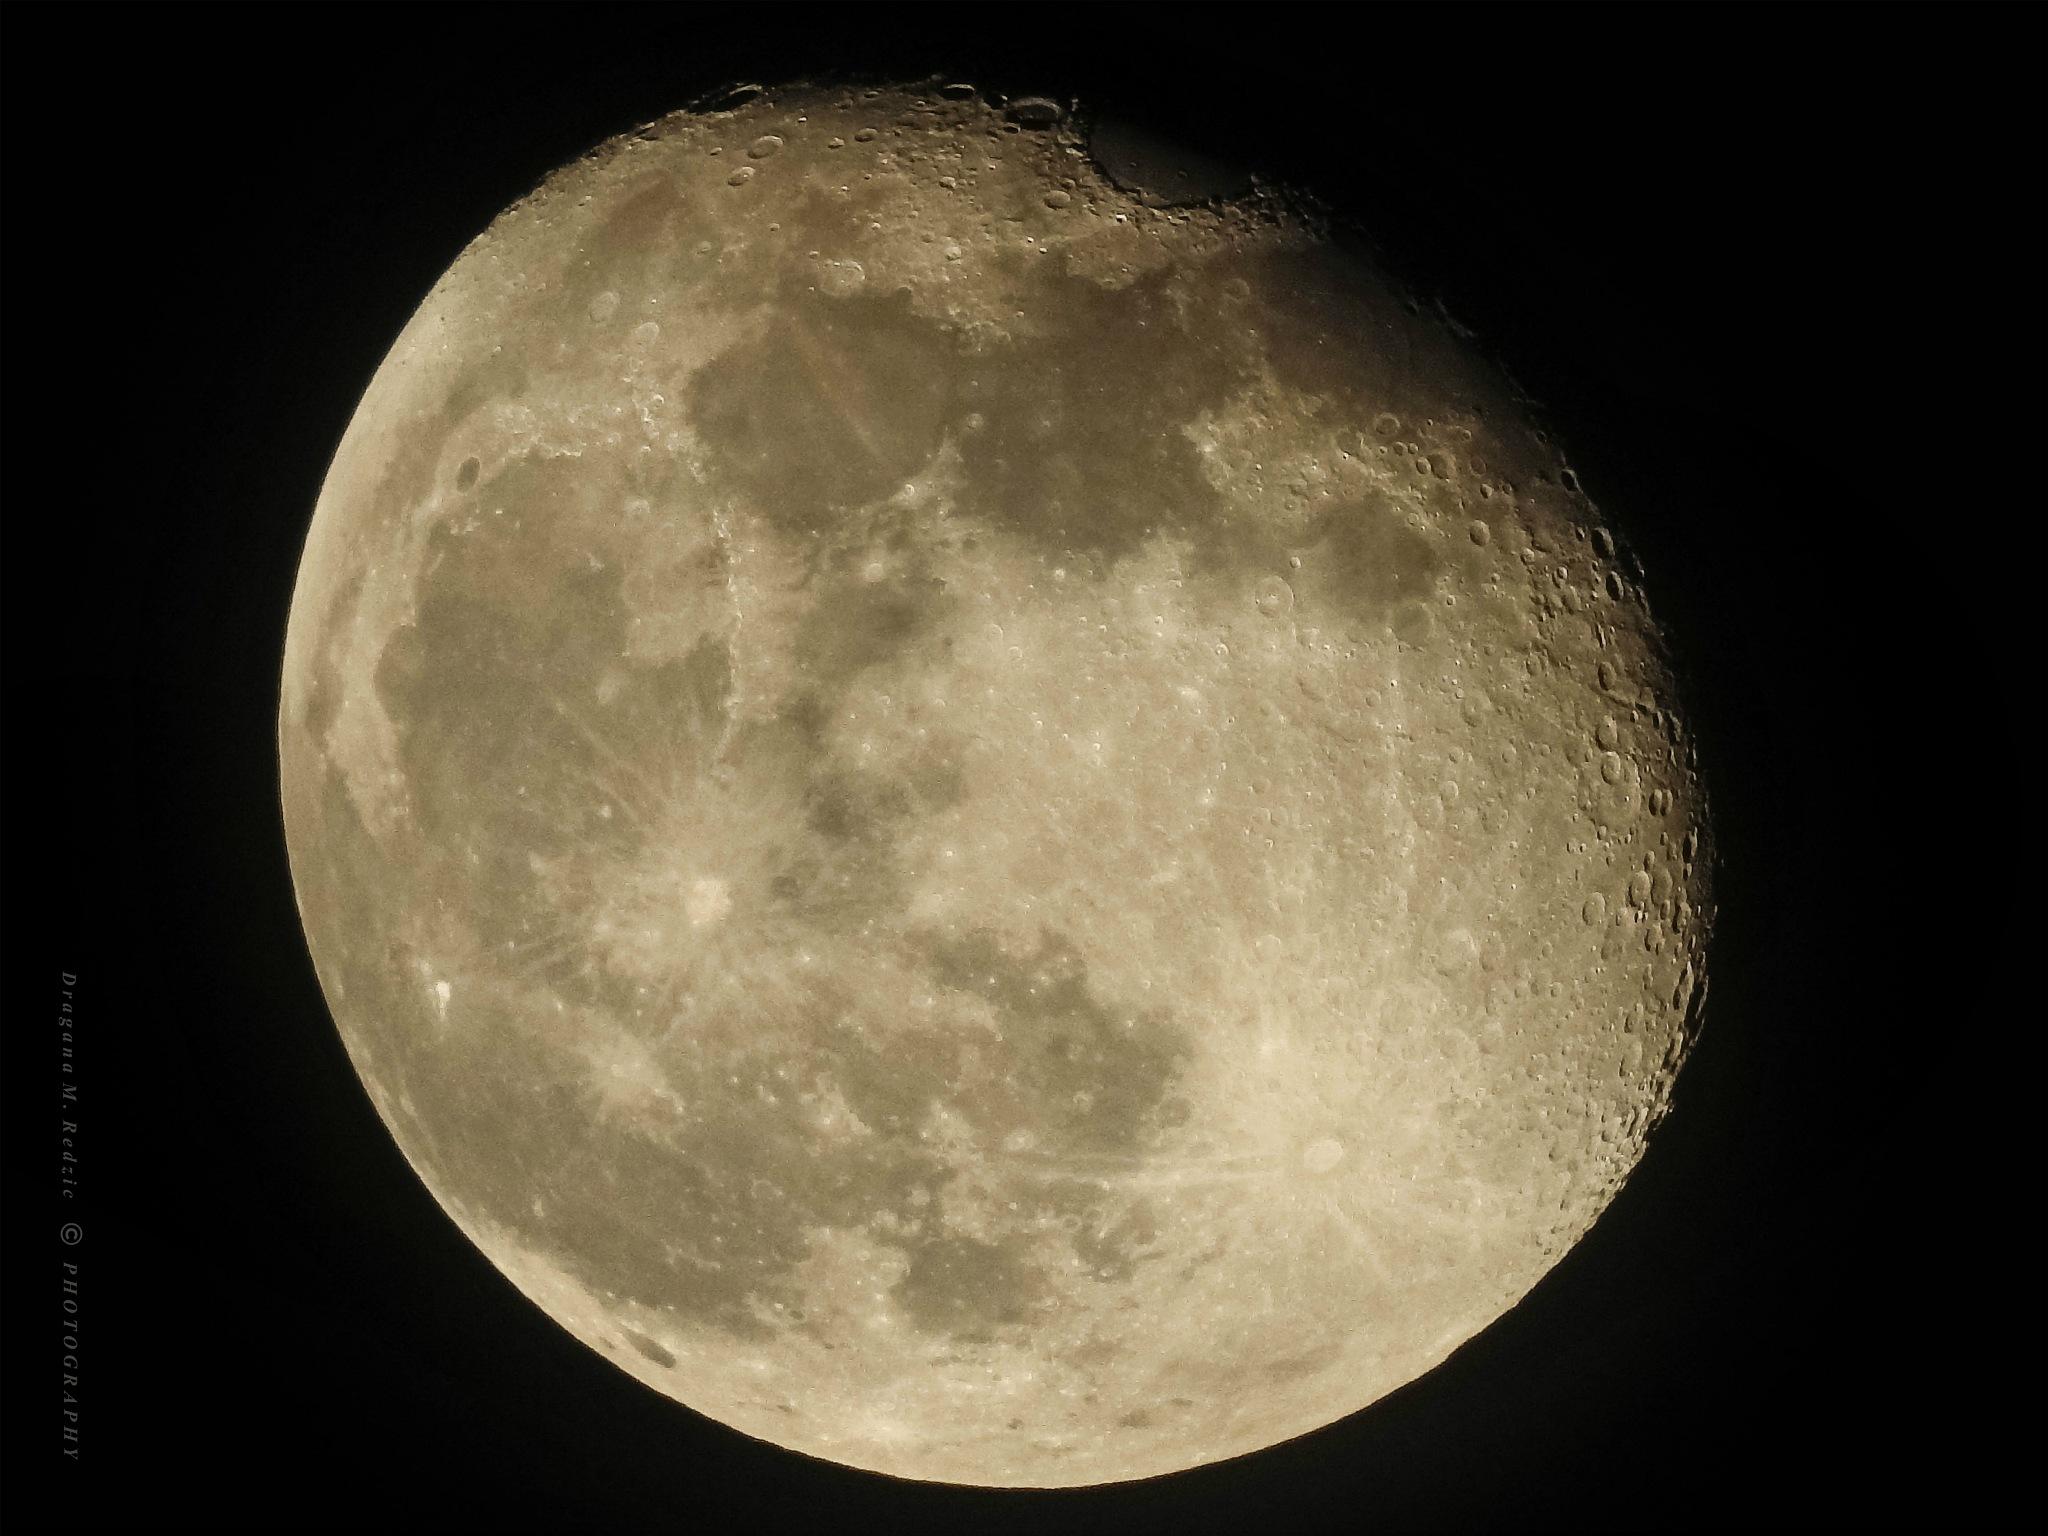 Beautiful Moon - 14-Feb-2017 - Over Serbia by Драгана М. Реџић